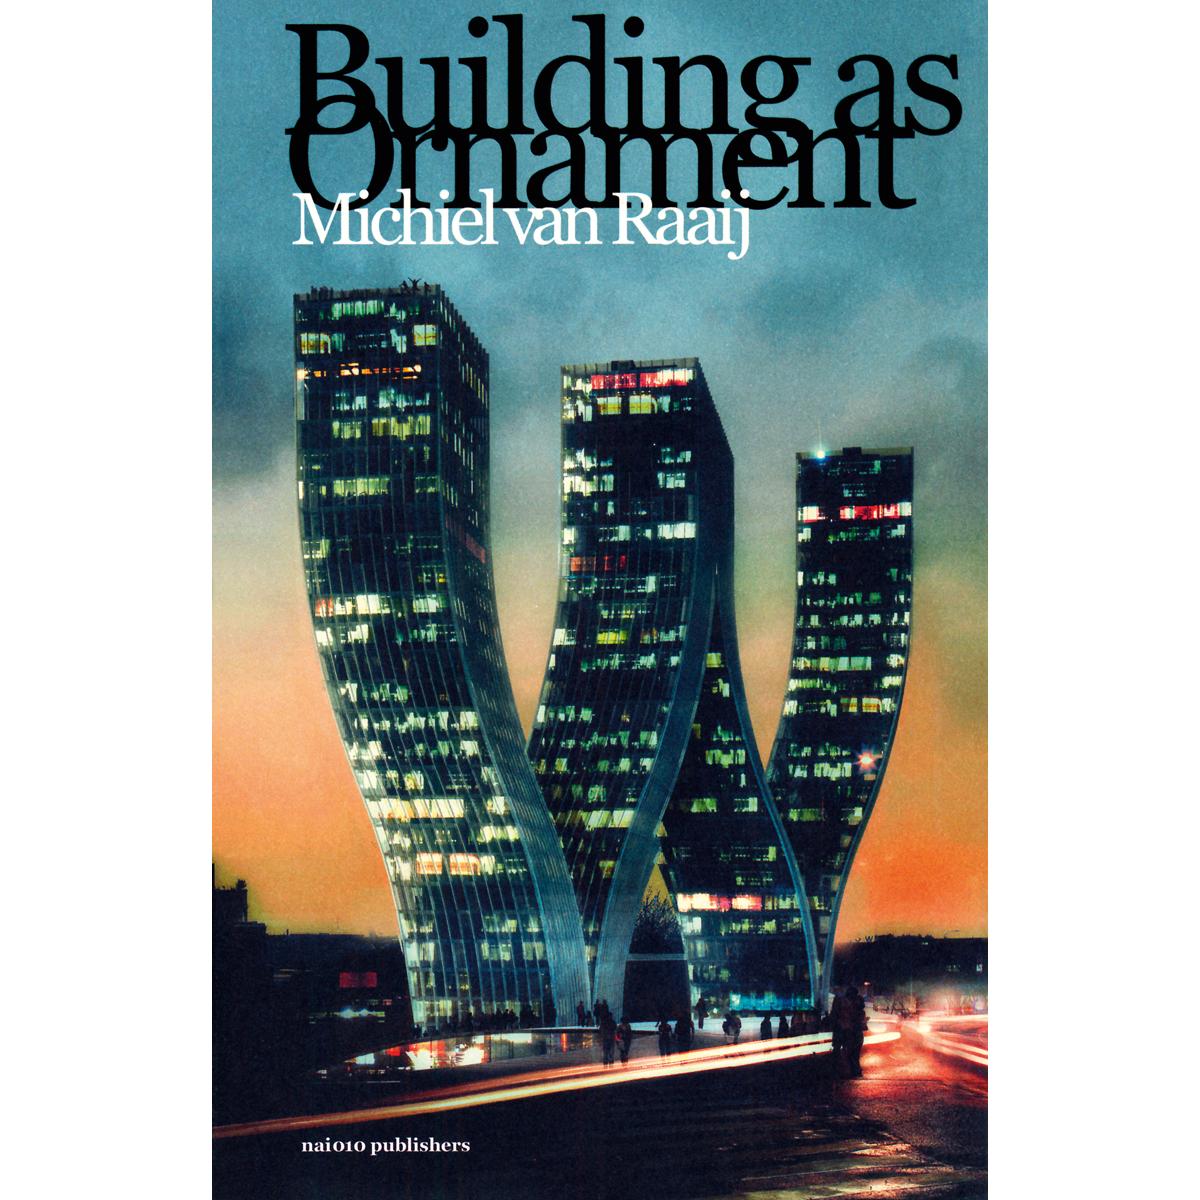 Building as Ornament